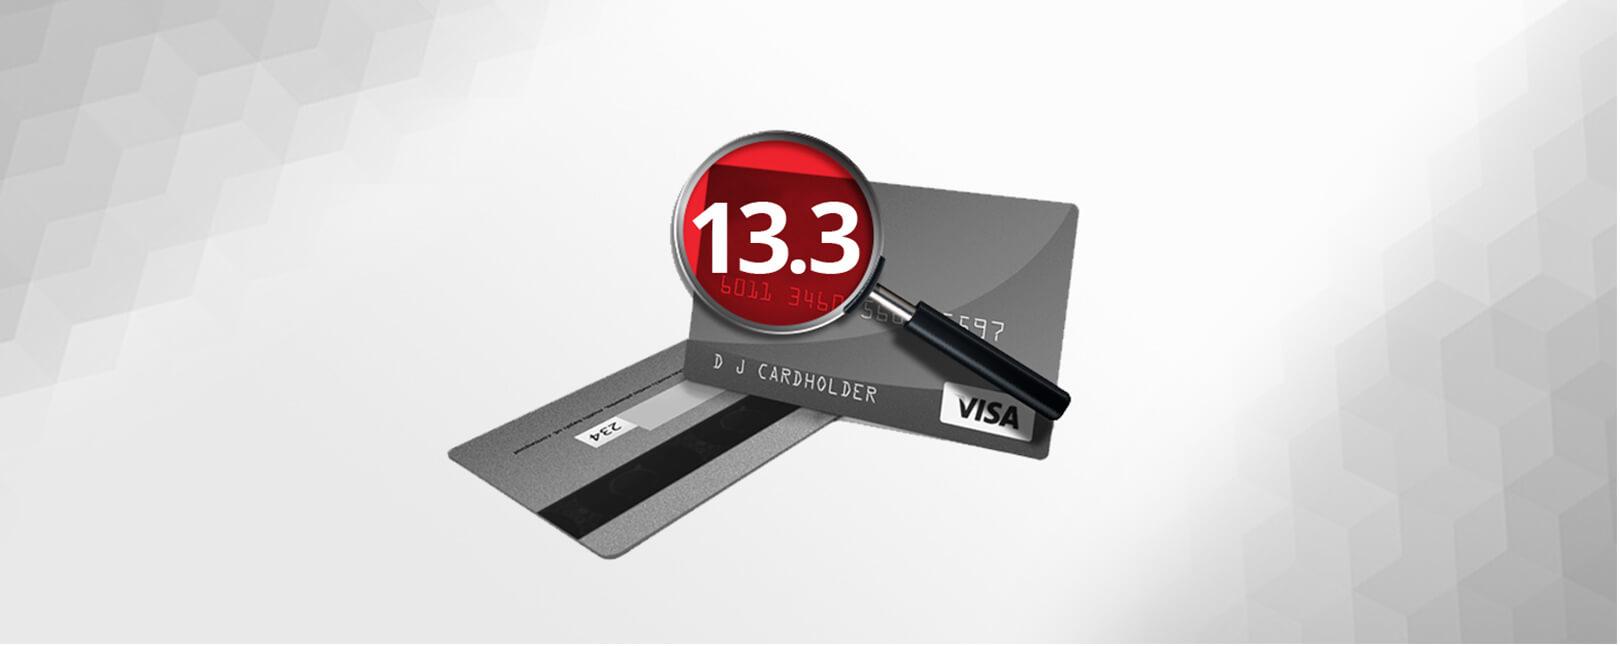 13.3 - Defective or Not as Described Merchandise/Services